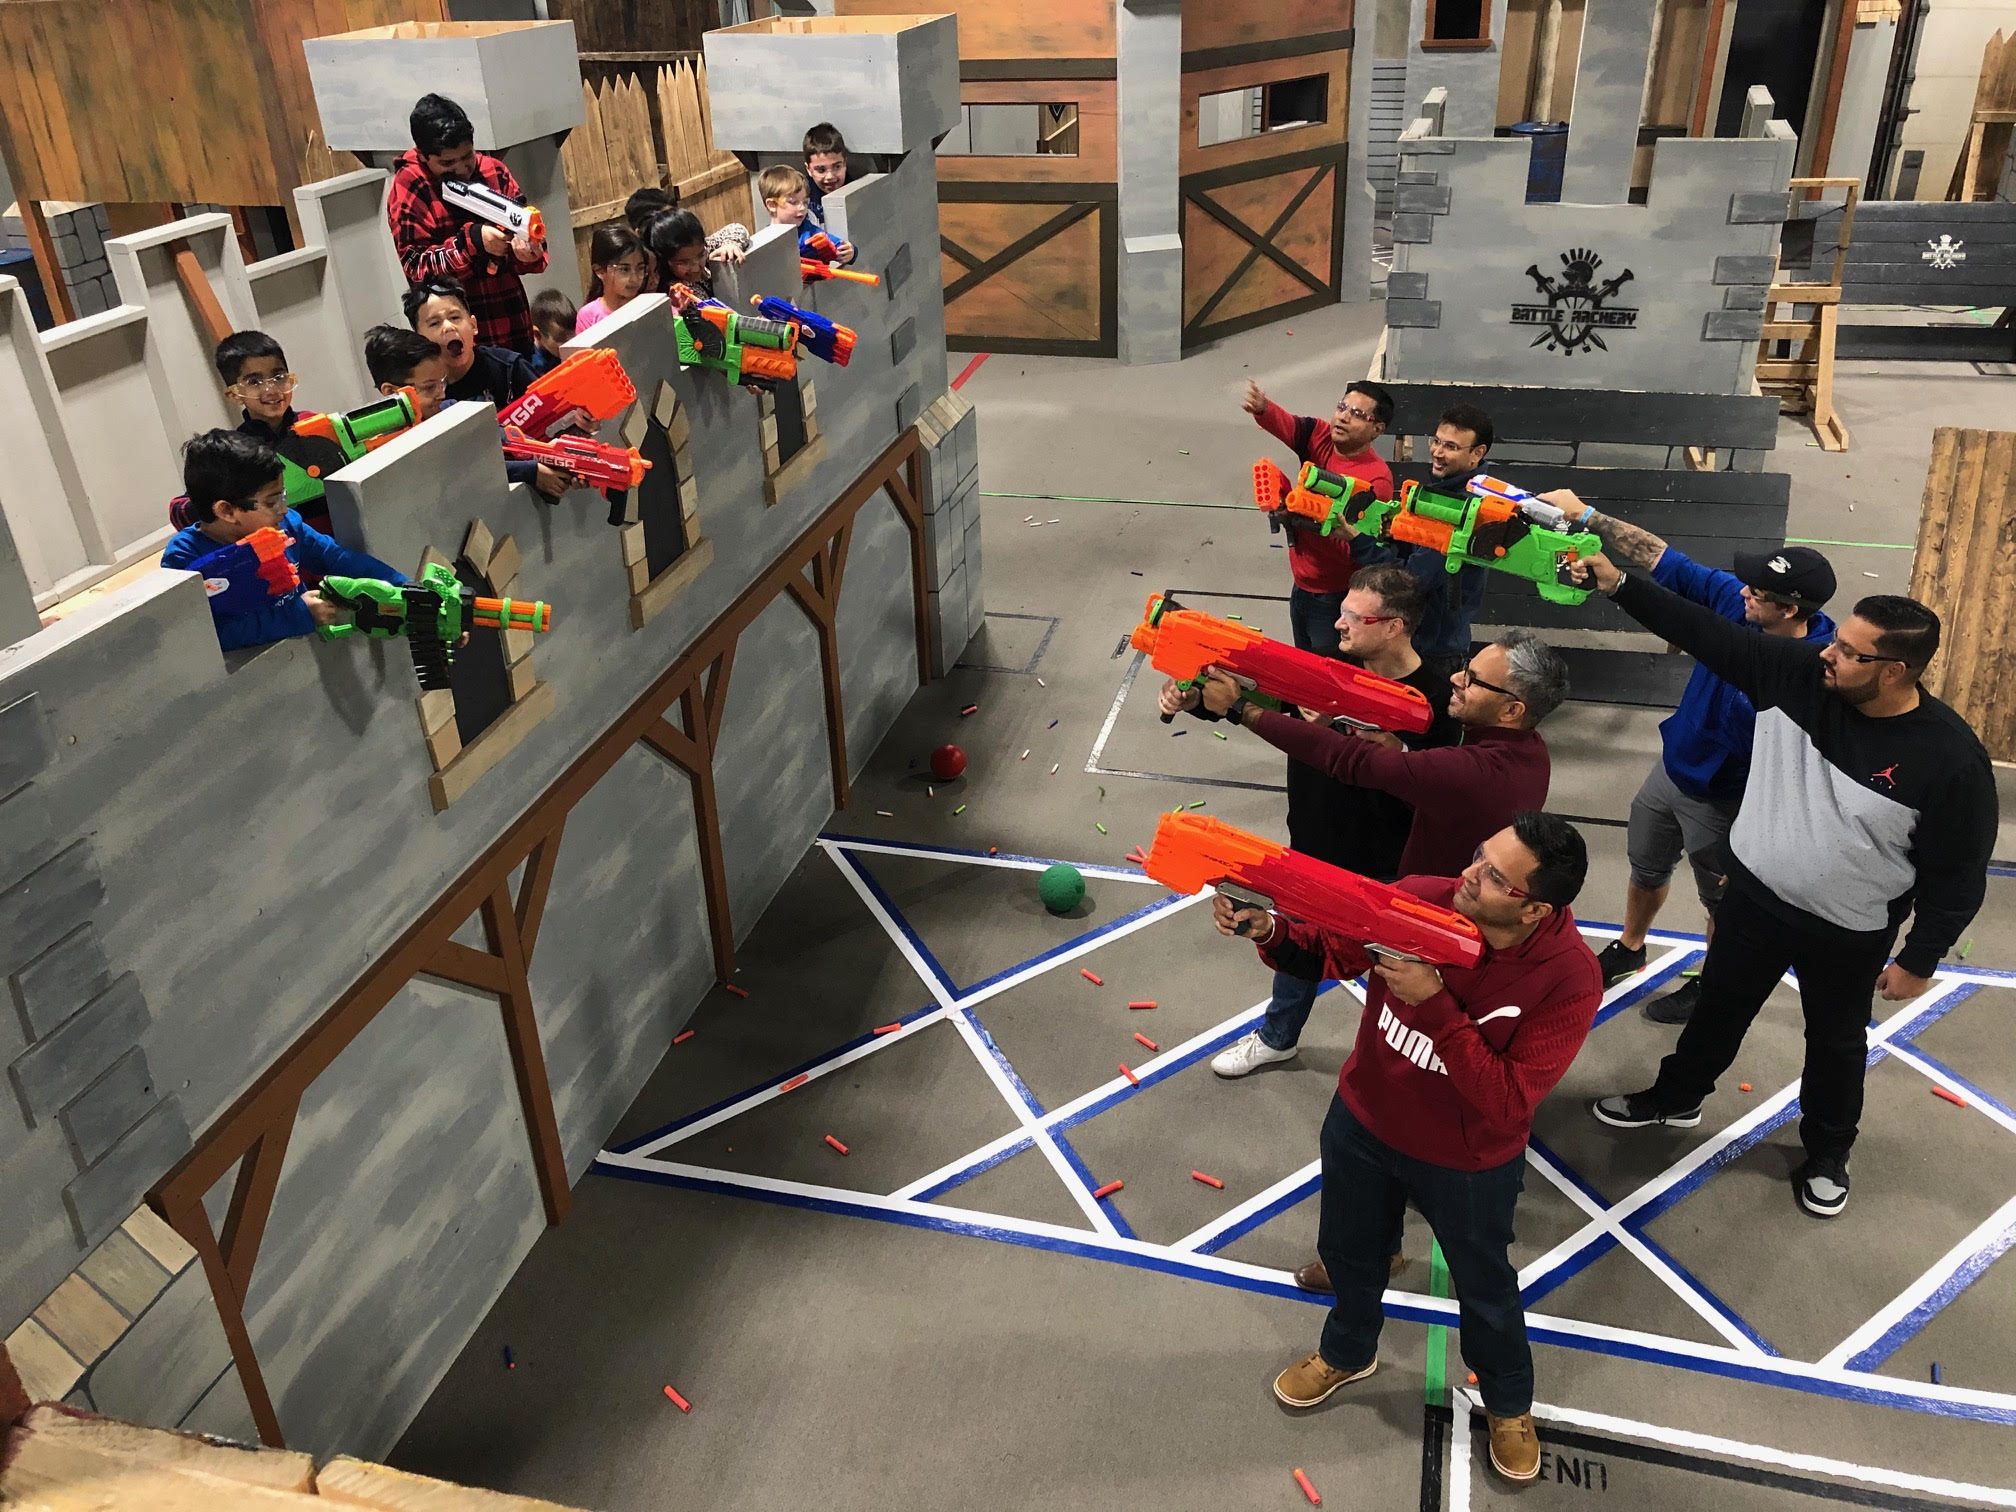 kids on bridge shoot adults